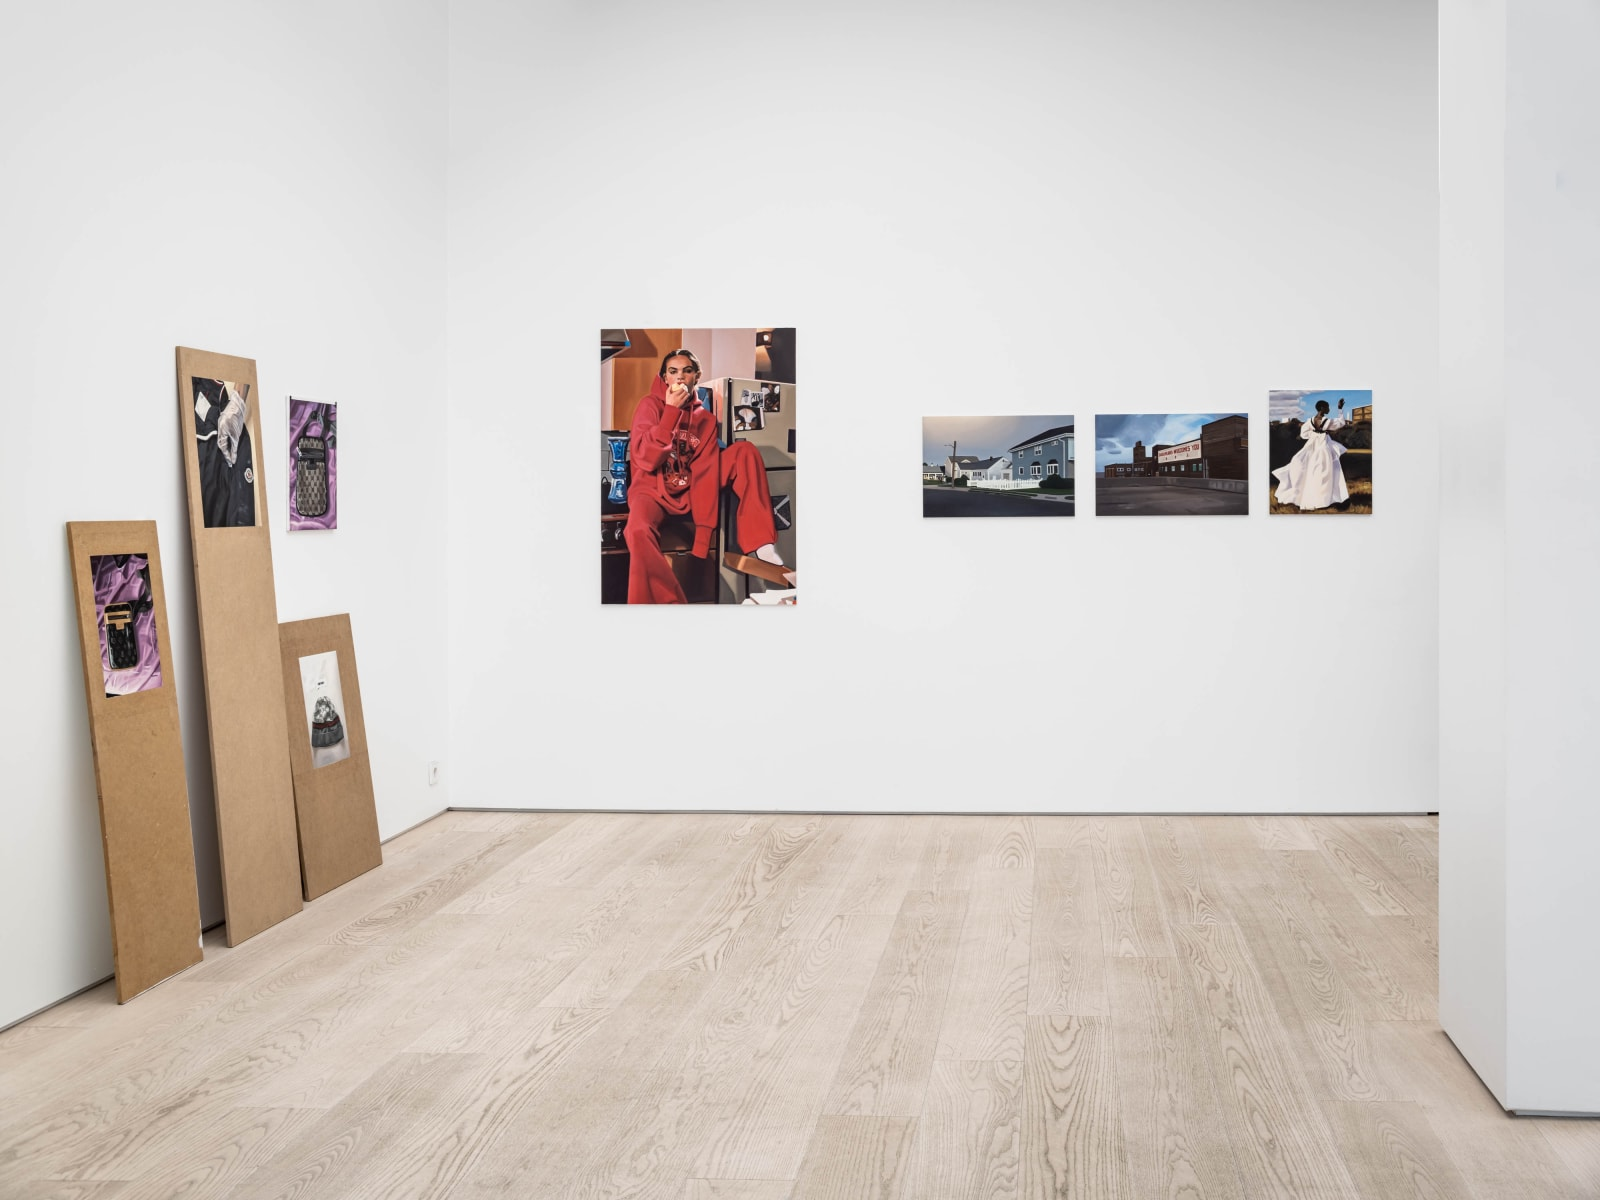 Lena Johansson Installation view Dreamland Welcmes You at Andréhn-Schiptjenko, Stockholm, 2021